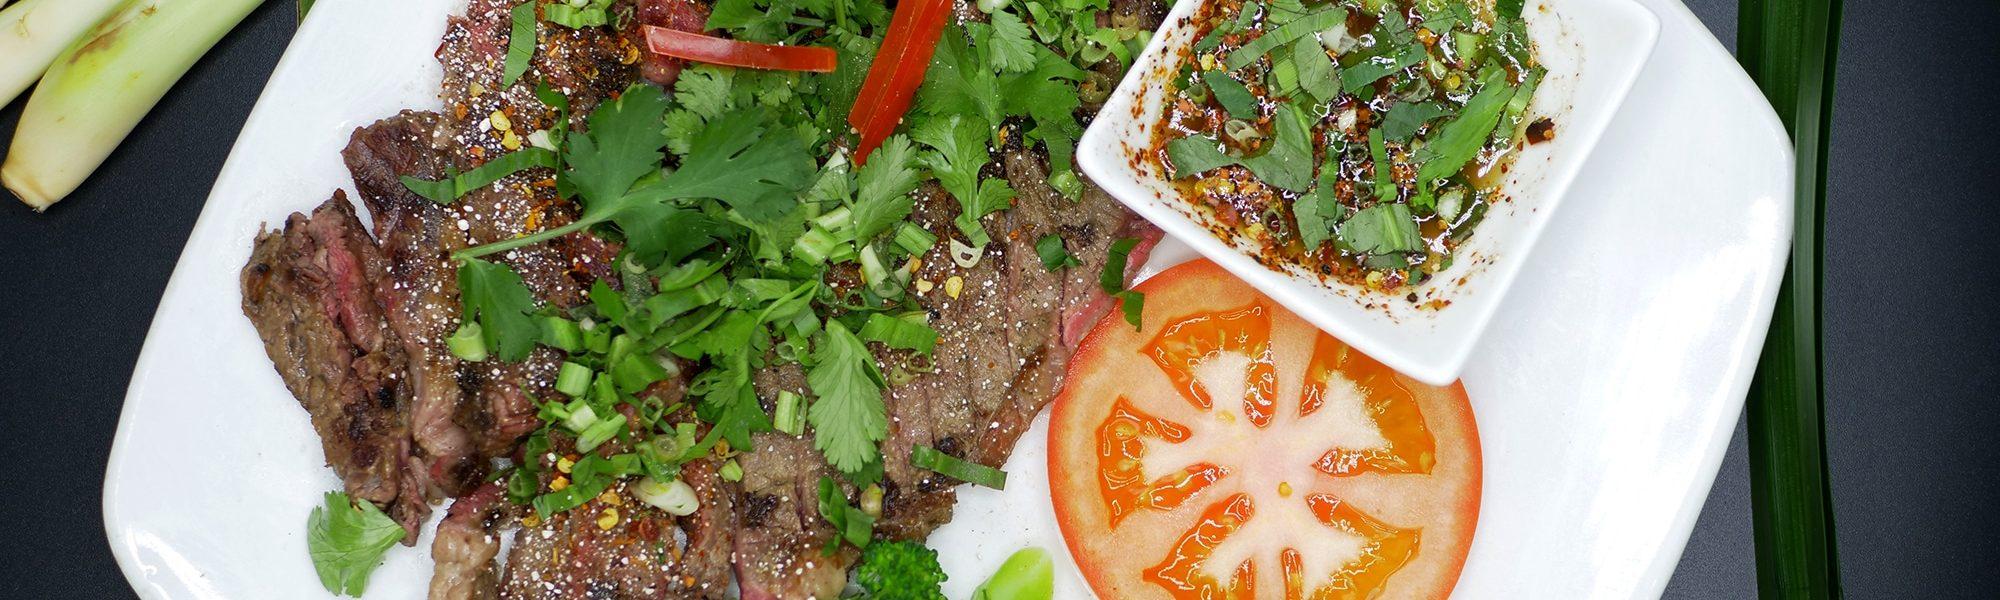 Plat Thailandais | Larmes du tigre | Restaurant Kok Ping Paris